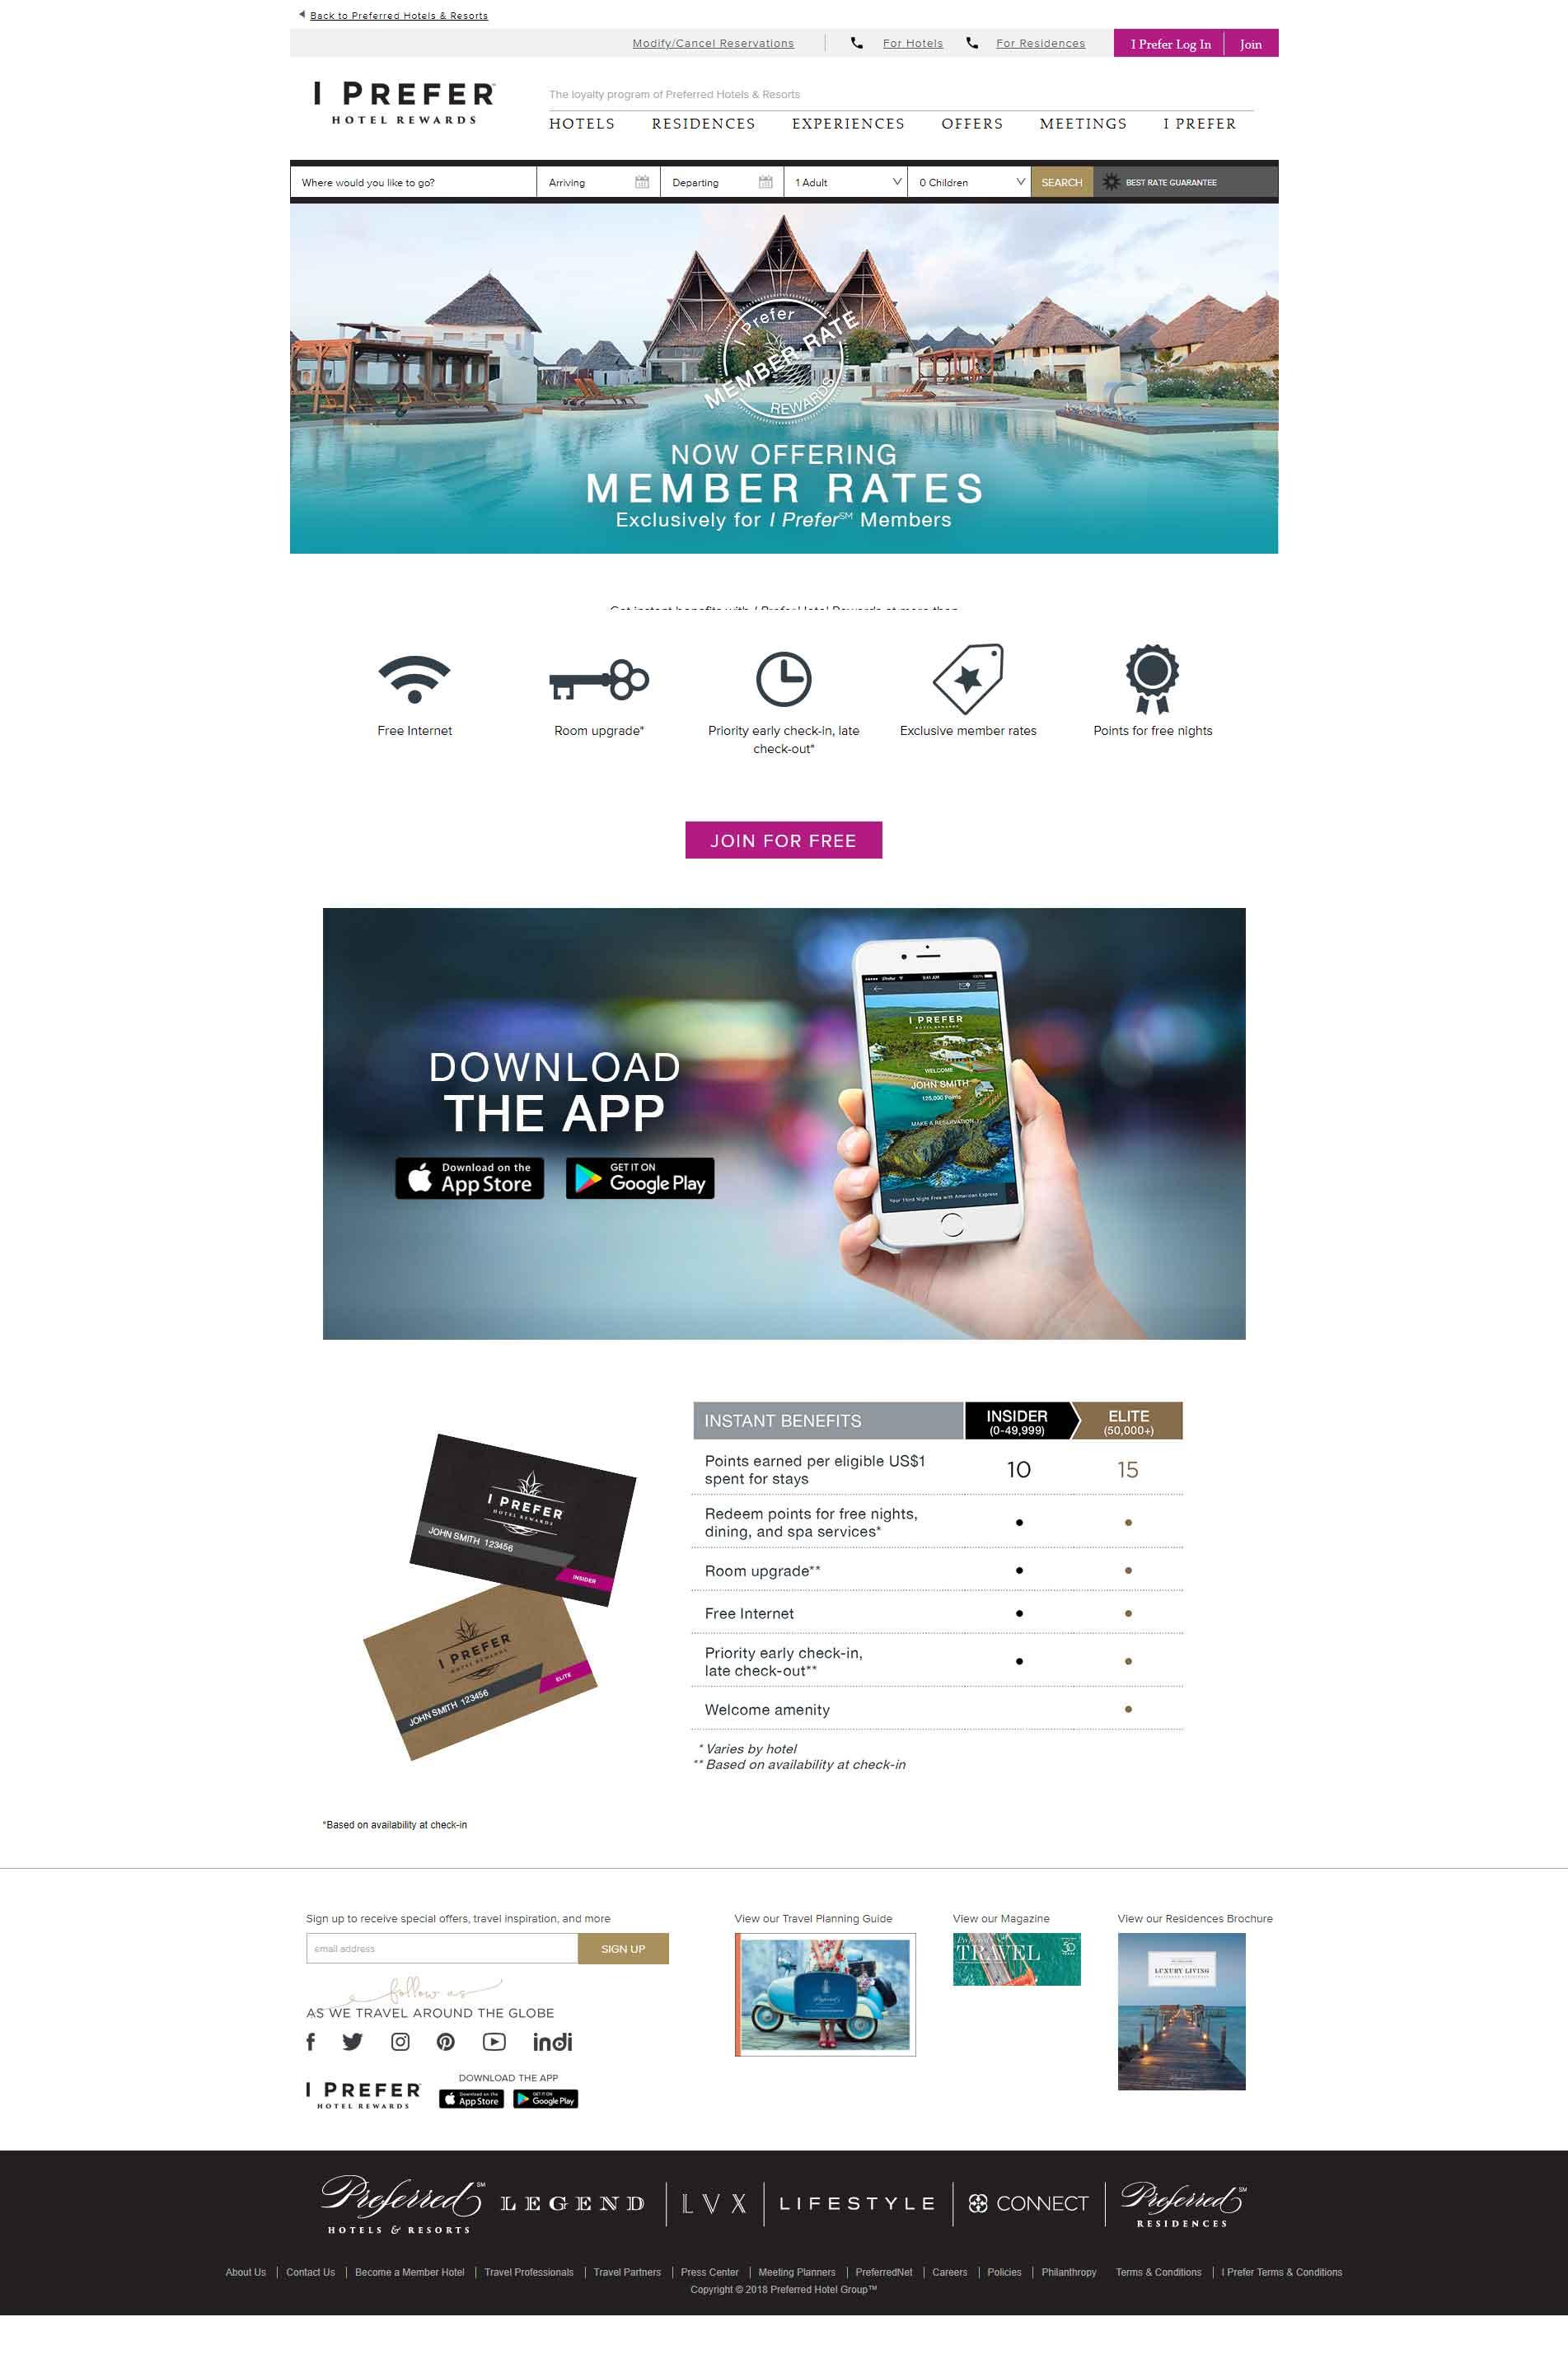 Preferred Luxury Hotel Website Design 2